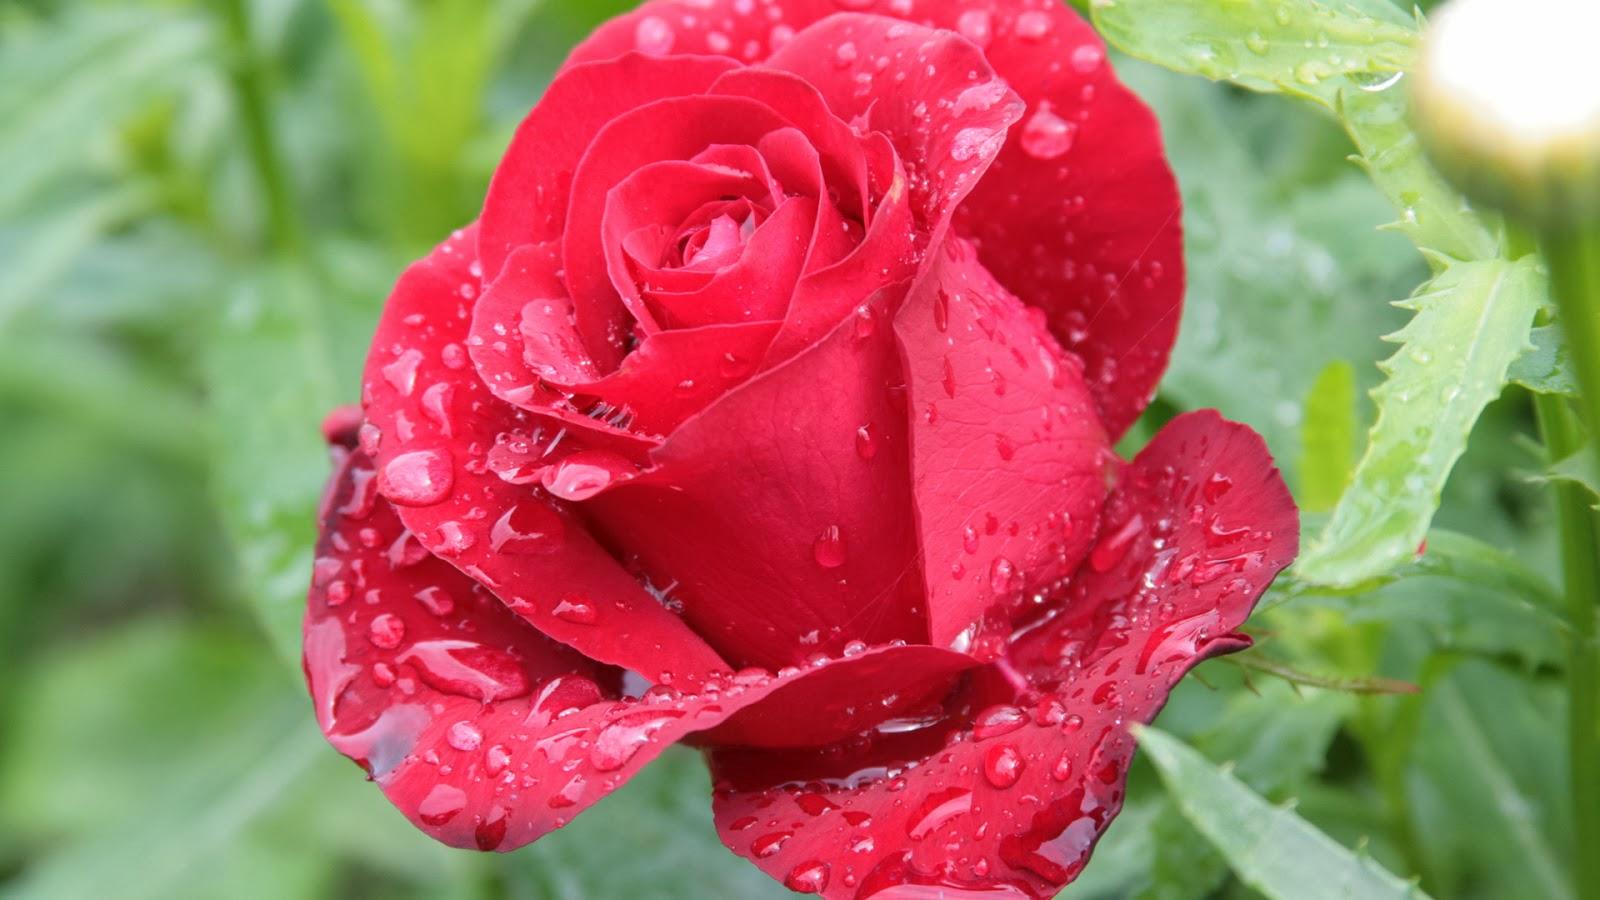 Mind Blowing HD Red Rose wallpaper ~ Allfreshwallpaper